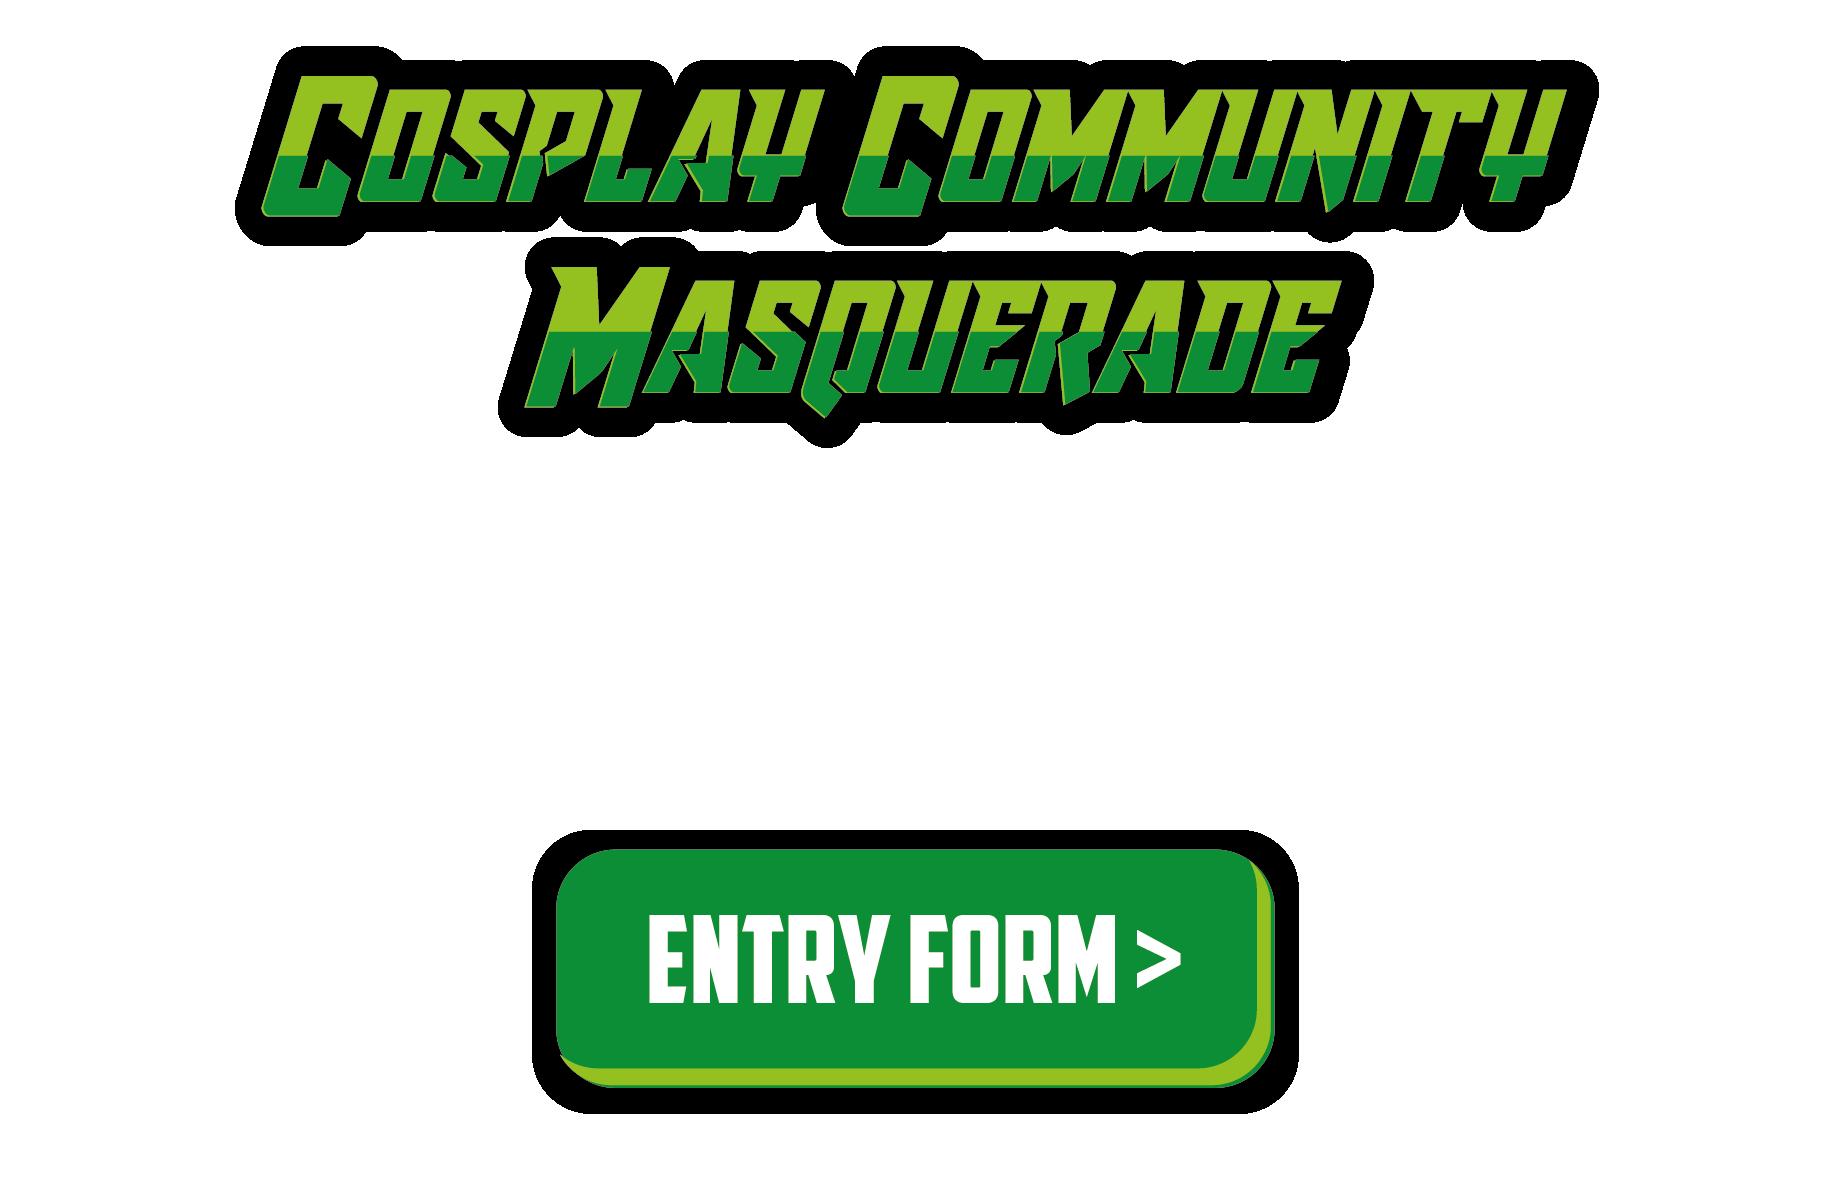 Cosplay community logo